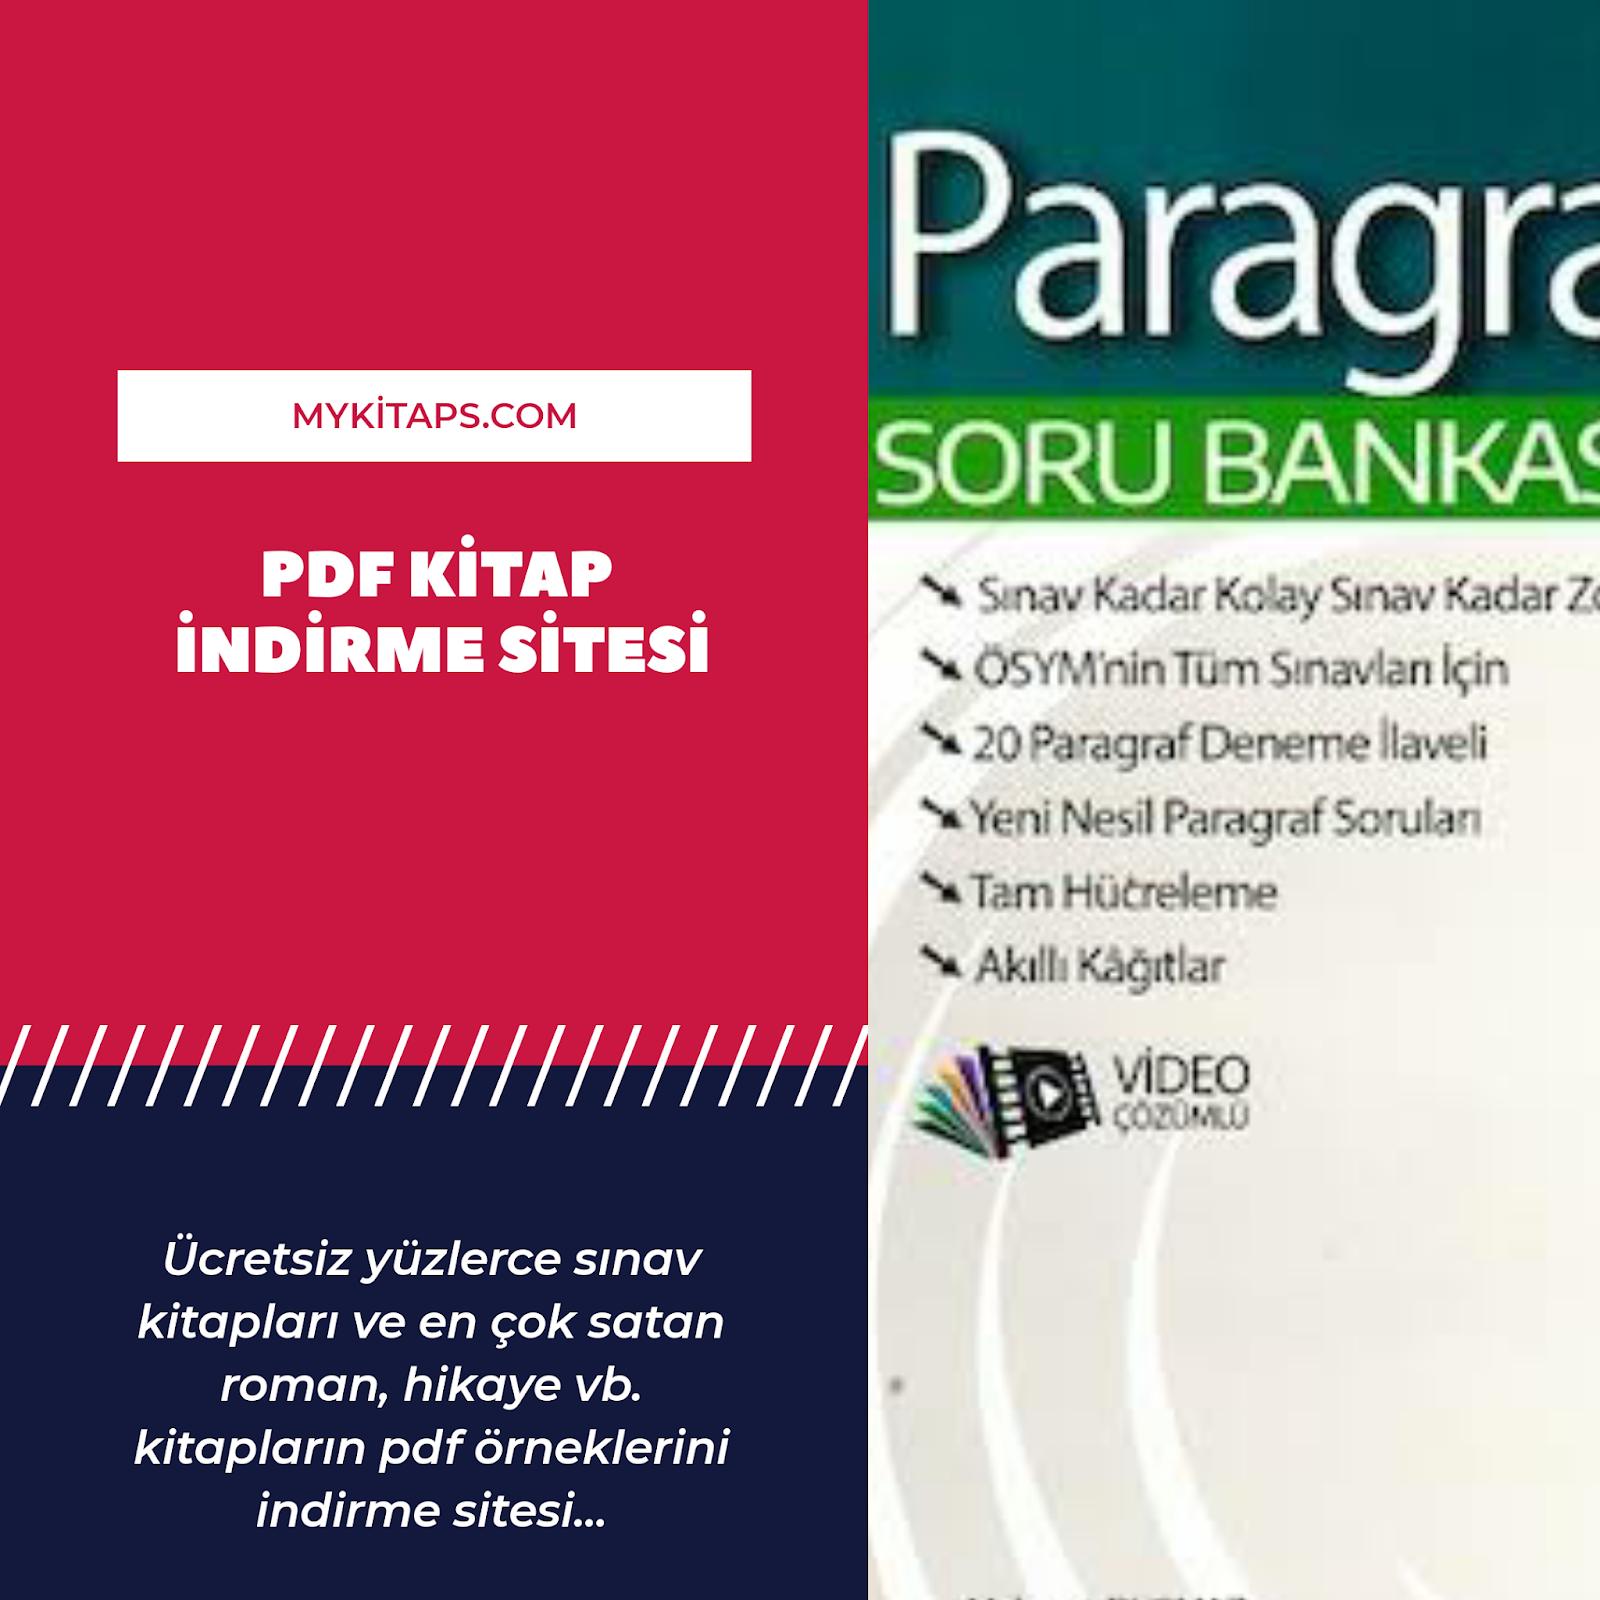 Bilgi Sarmal Paragraf Soru Bankası 2021.pdf